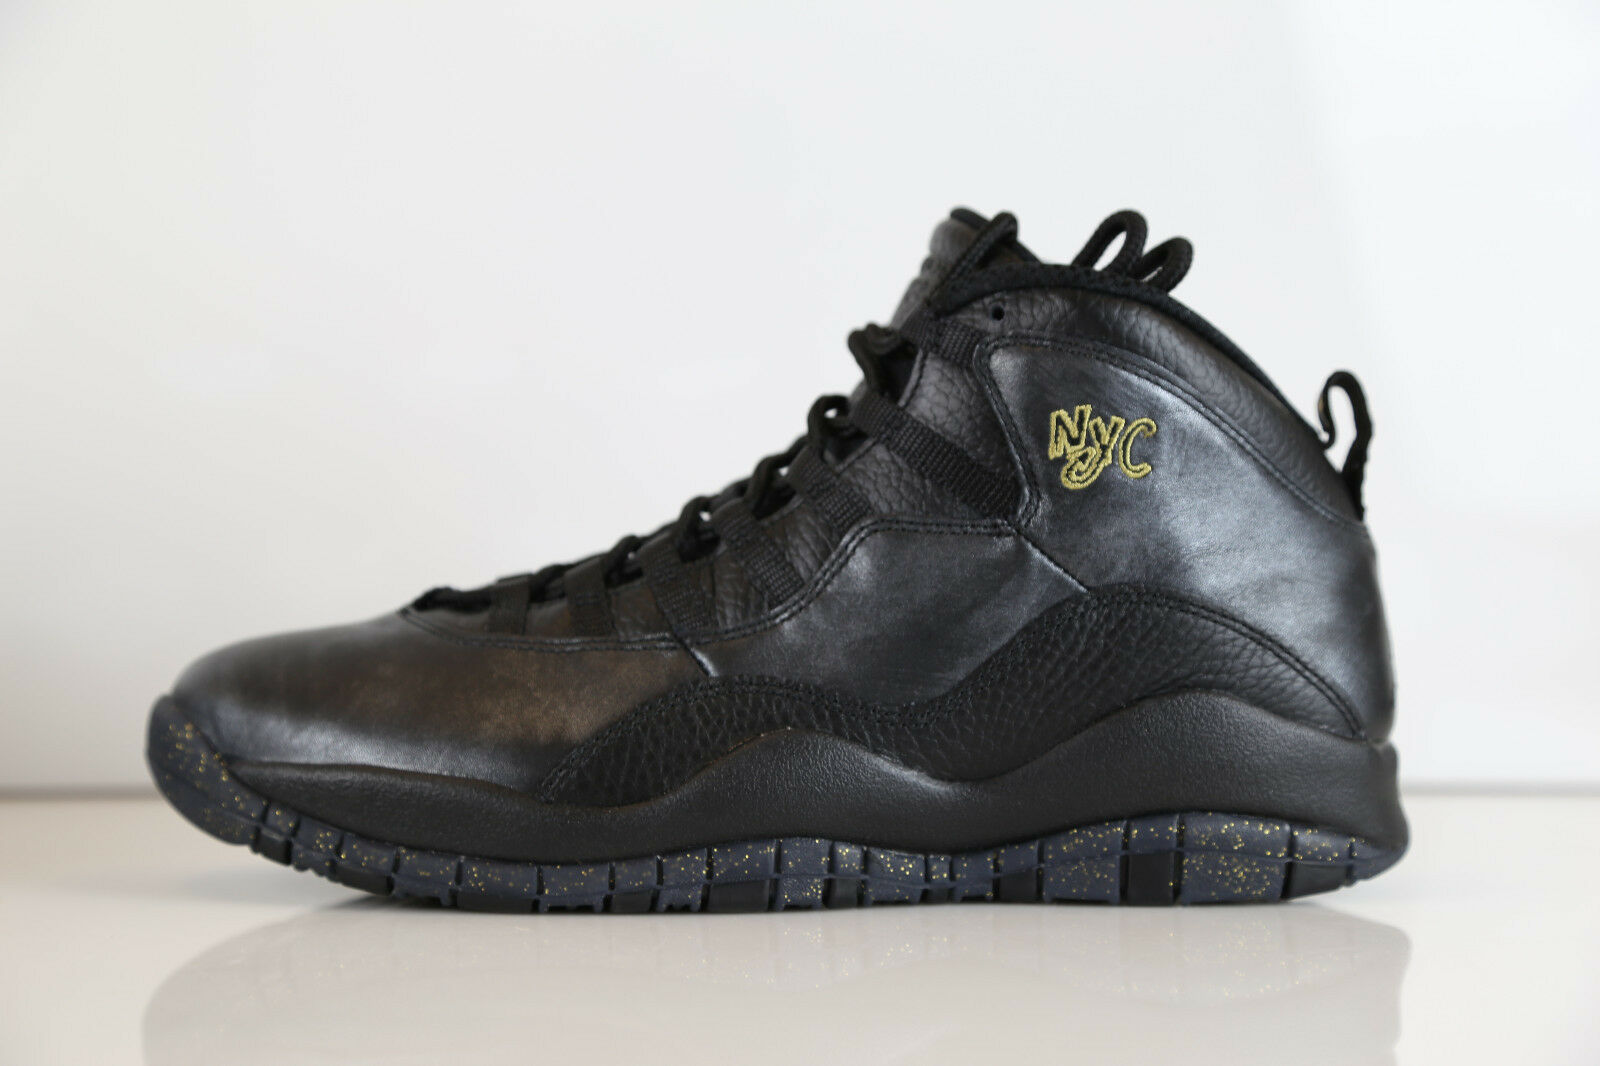 Nike air jordan retro - 10 new york york york city pack schwarzes gold 310805-012 - 11 12 x paris 784963